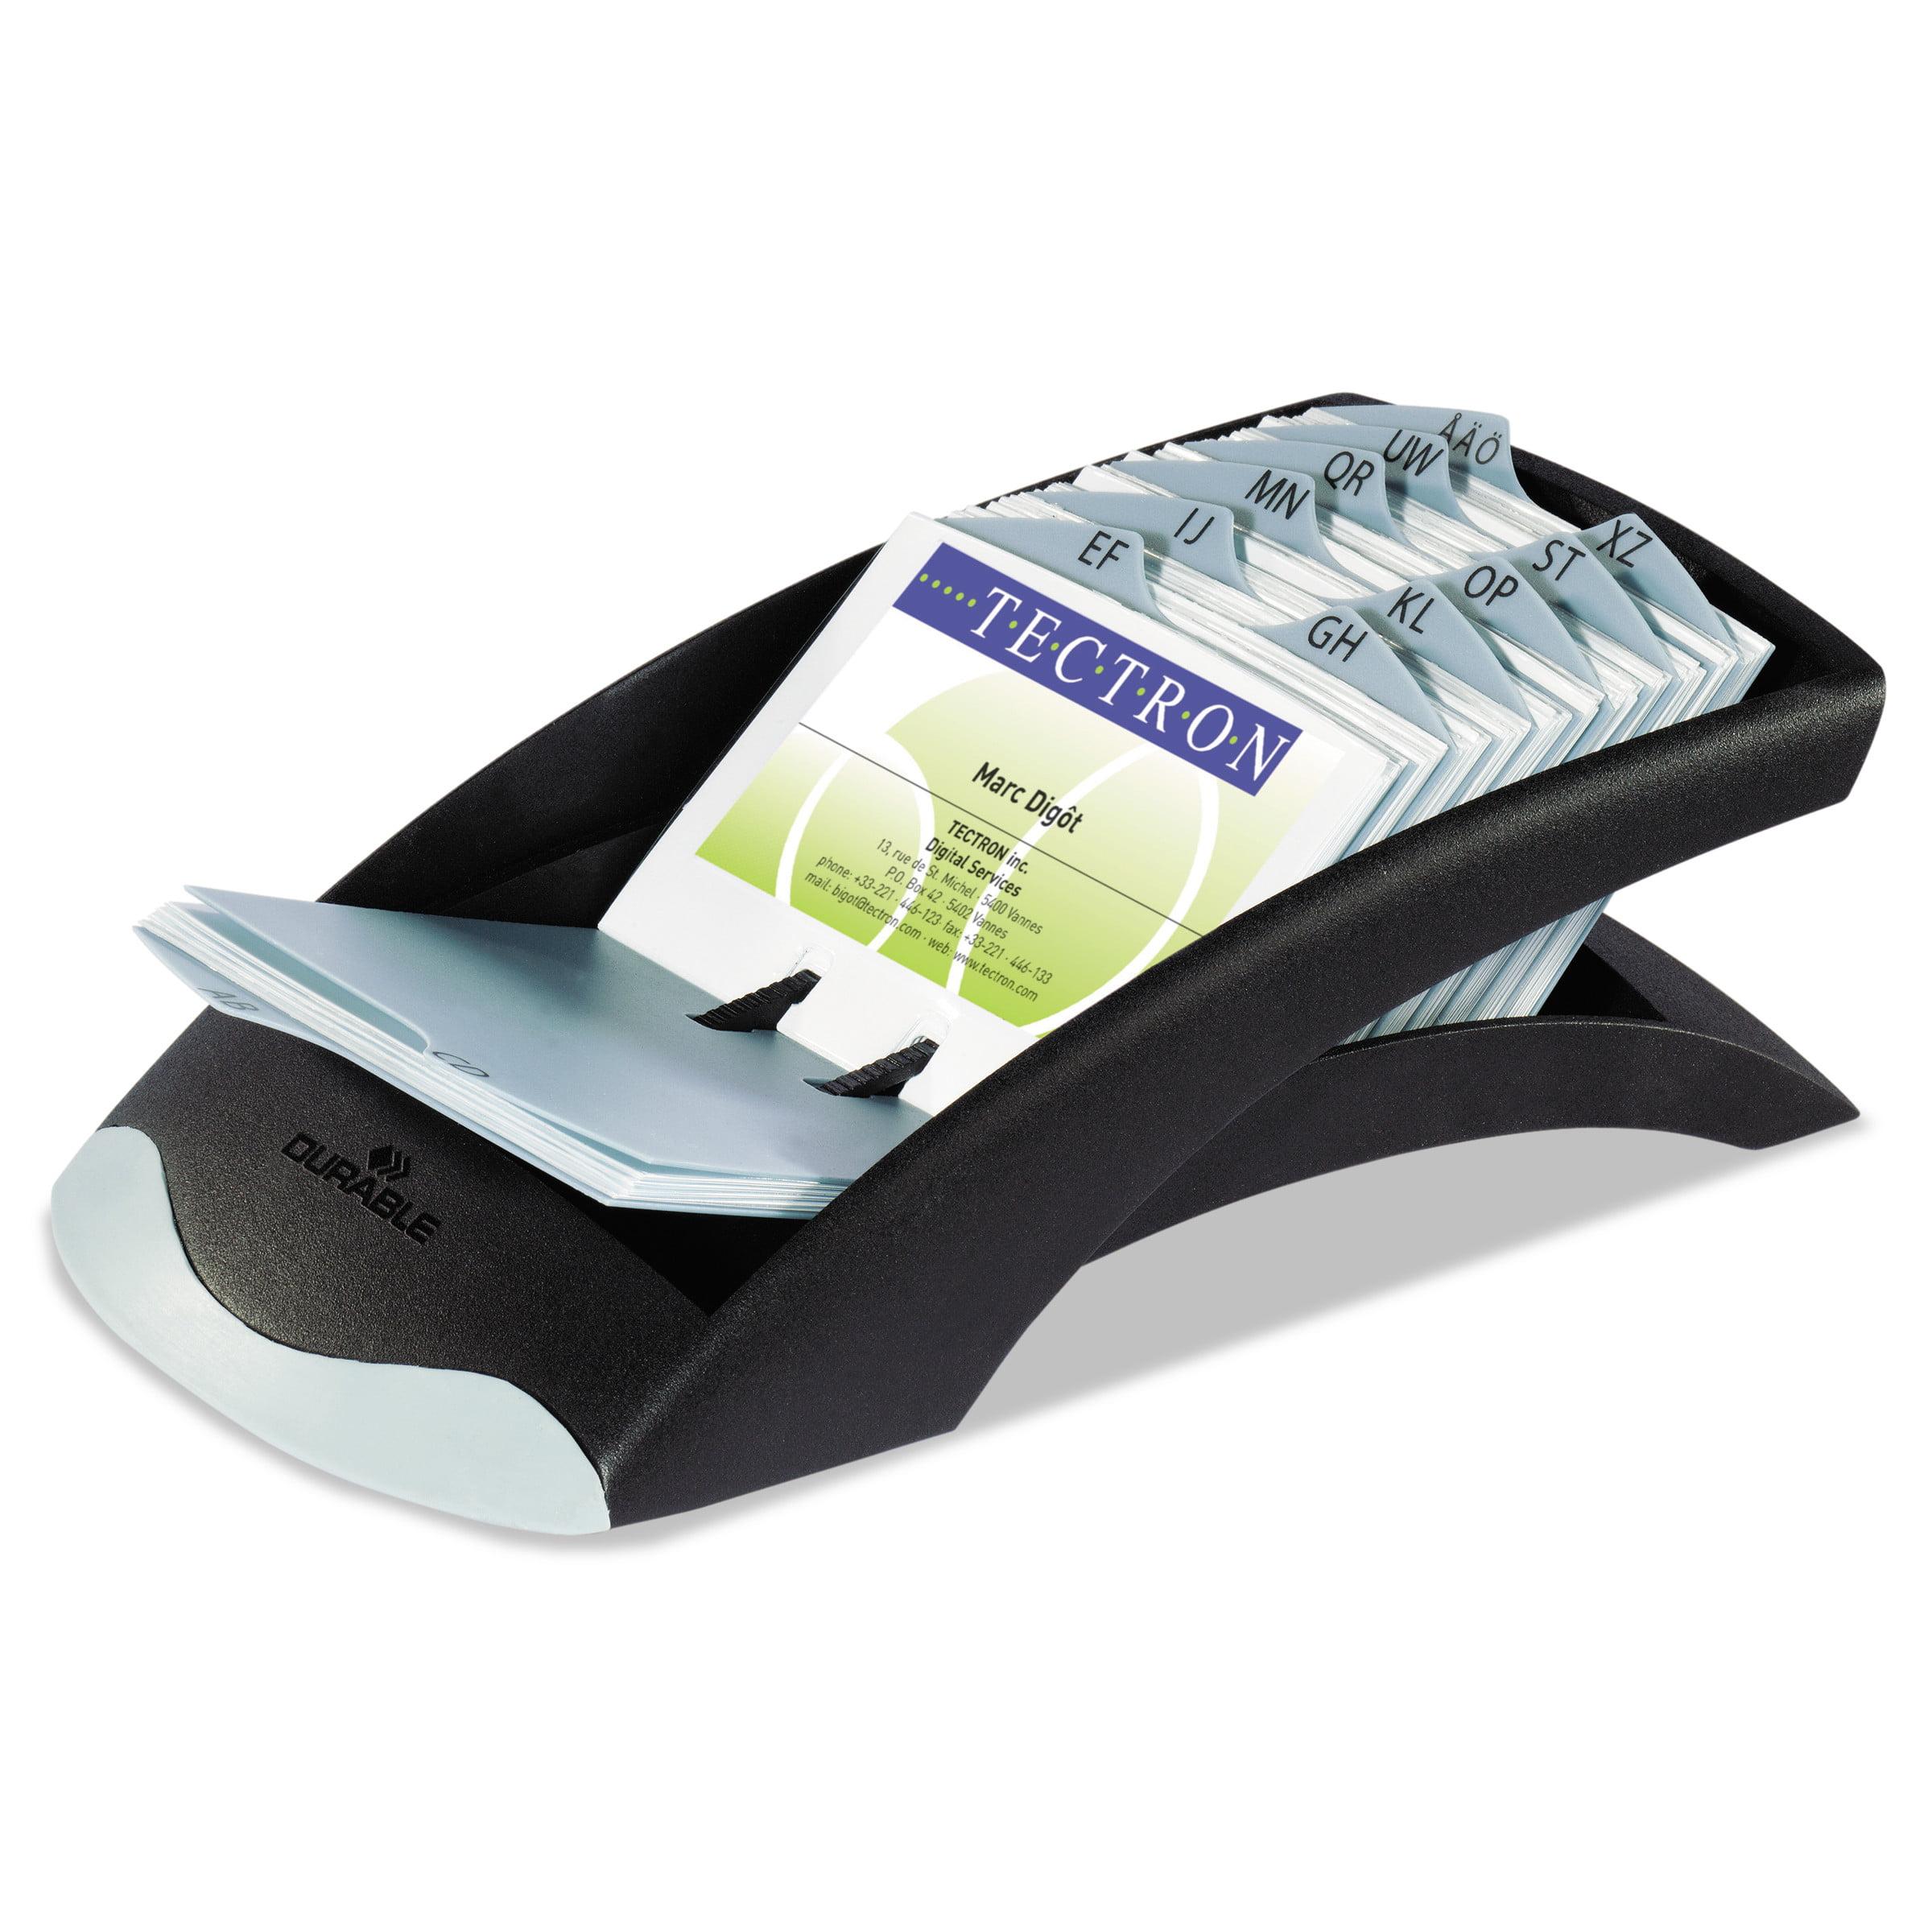 Durable VISIFIX Desk Business Card File, Holds 200 4 1/8 x 2 7/8 Cards, Graphite/Black -DBL241301